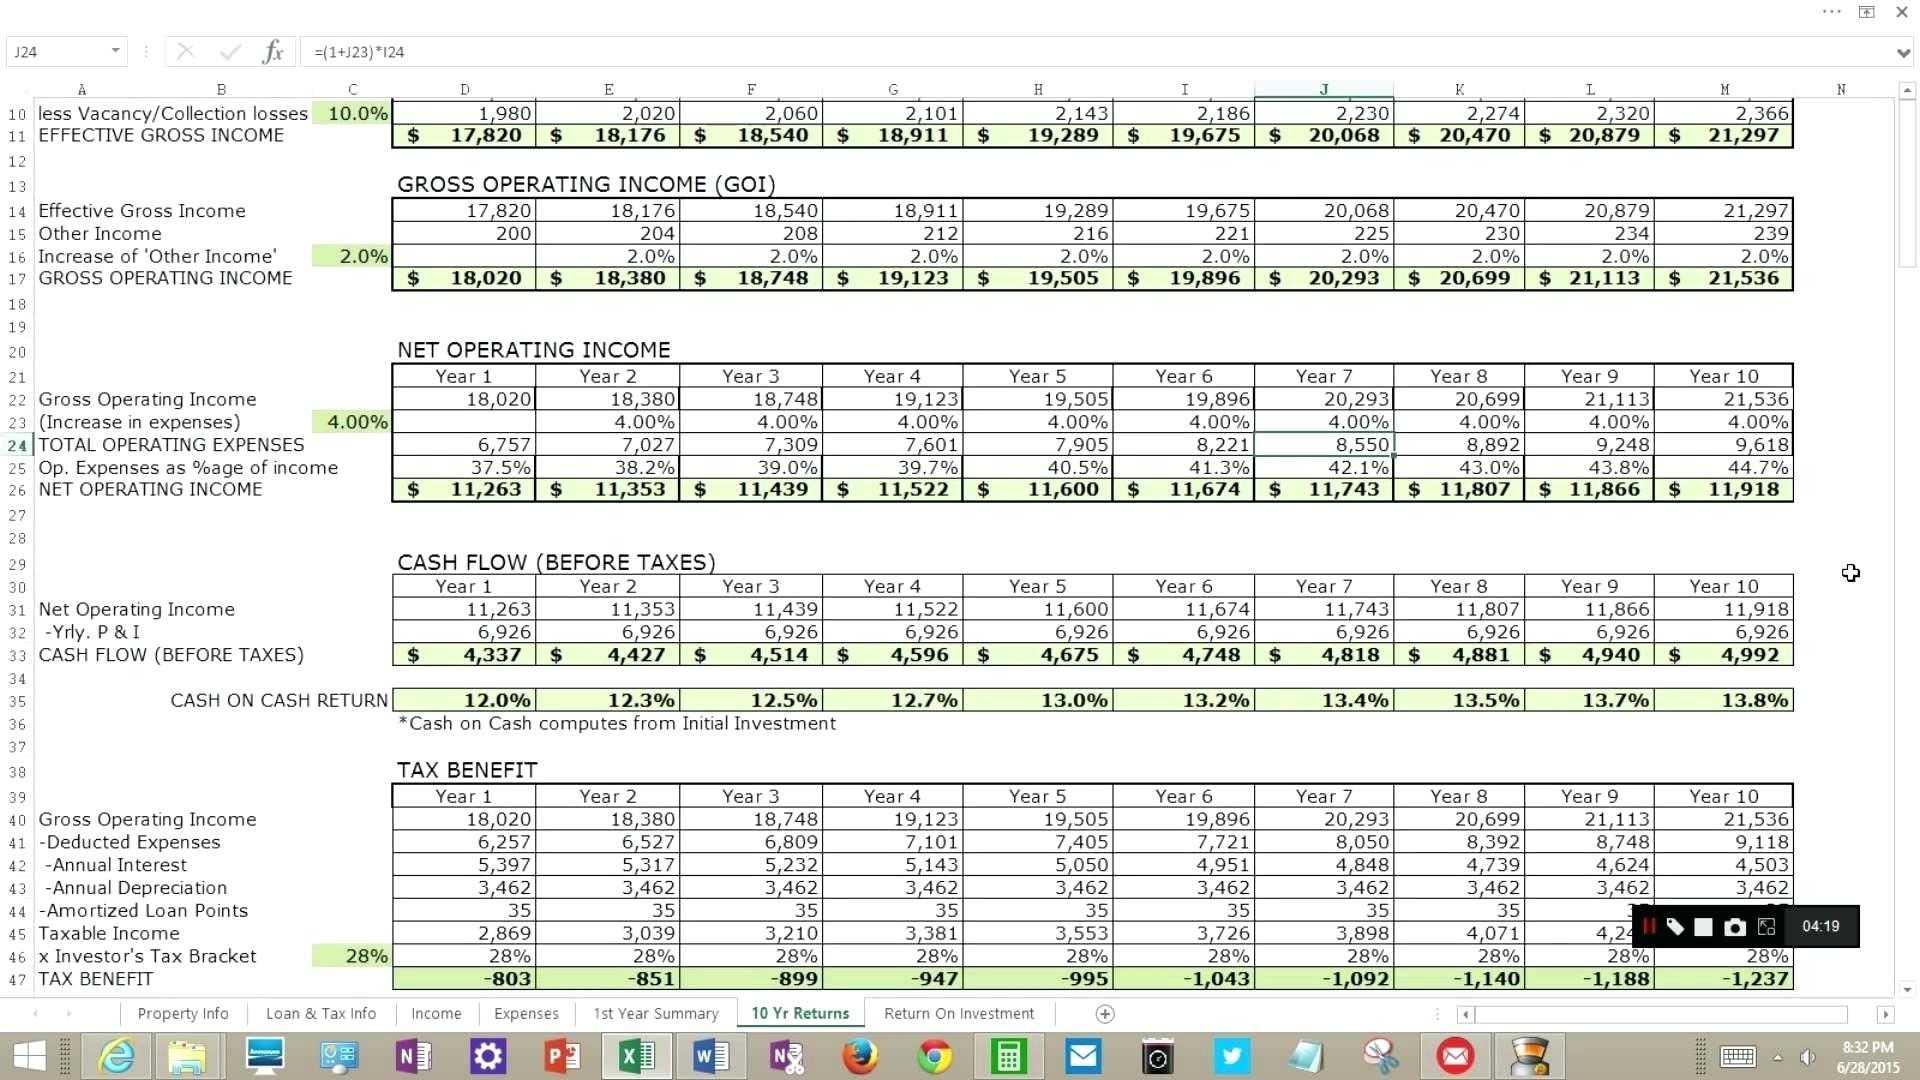 Name that Investment Worksheet or Spreadsheet Fresh Real Estate Investment Analysis Spreadsheet Hi Res